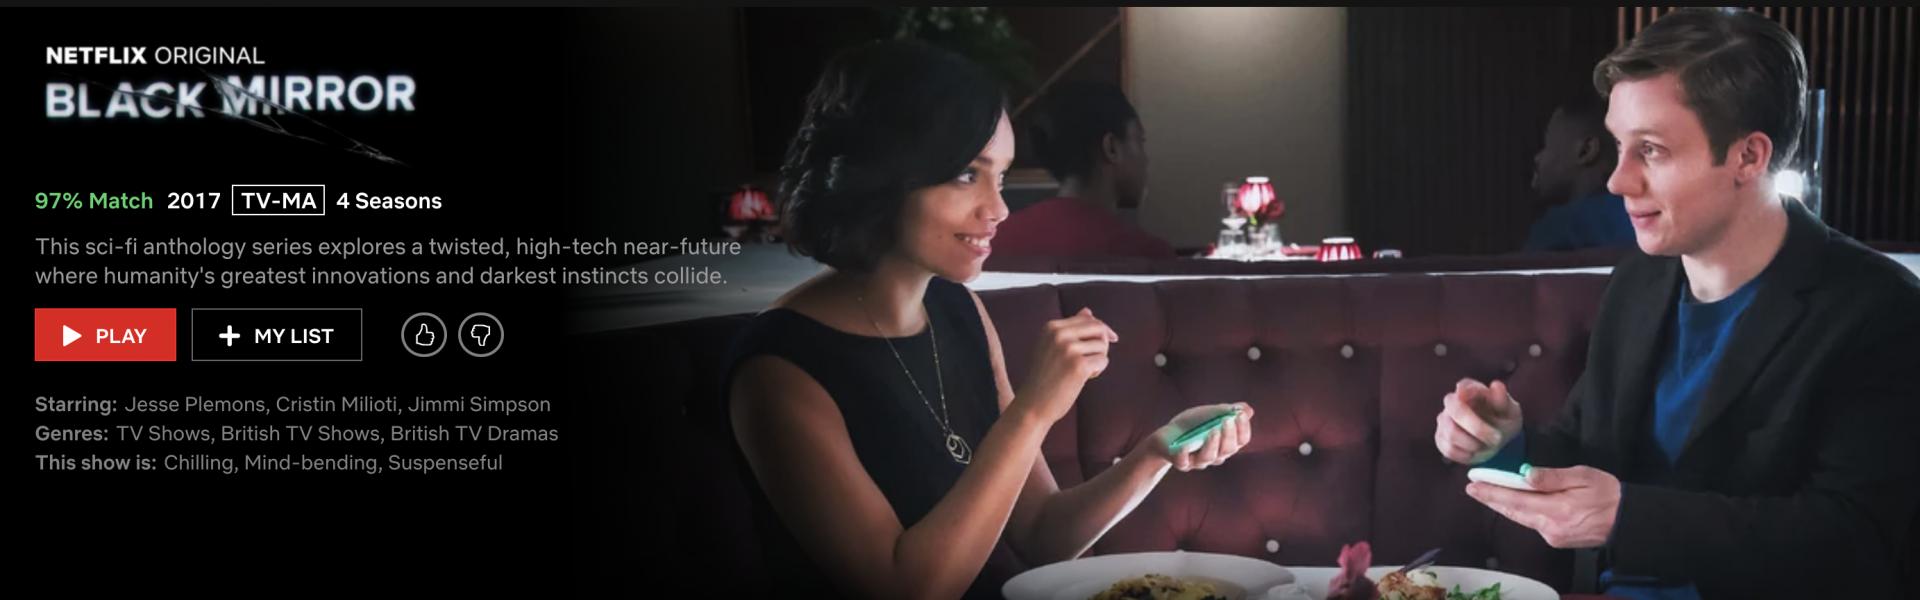 Black Mirror – Getting High Watching Netflix